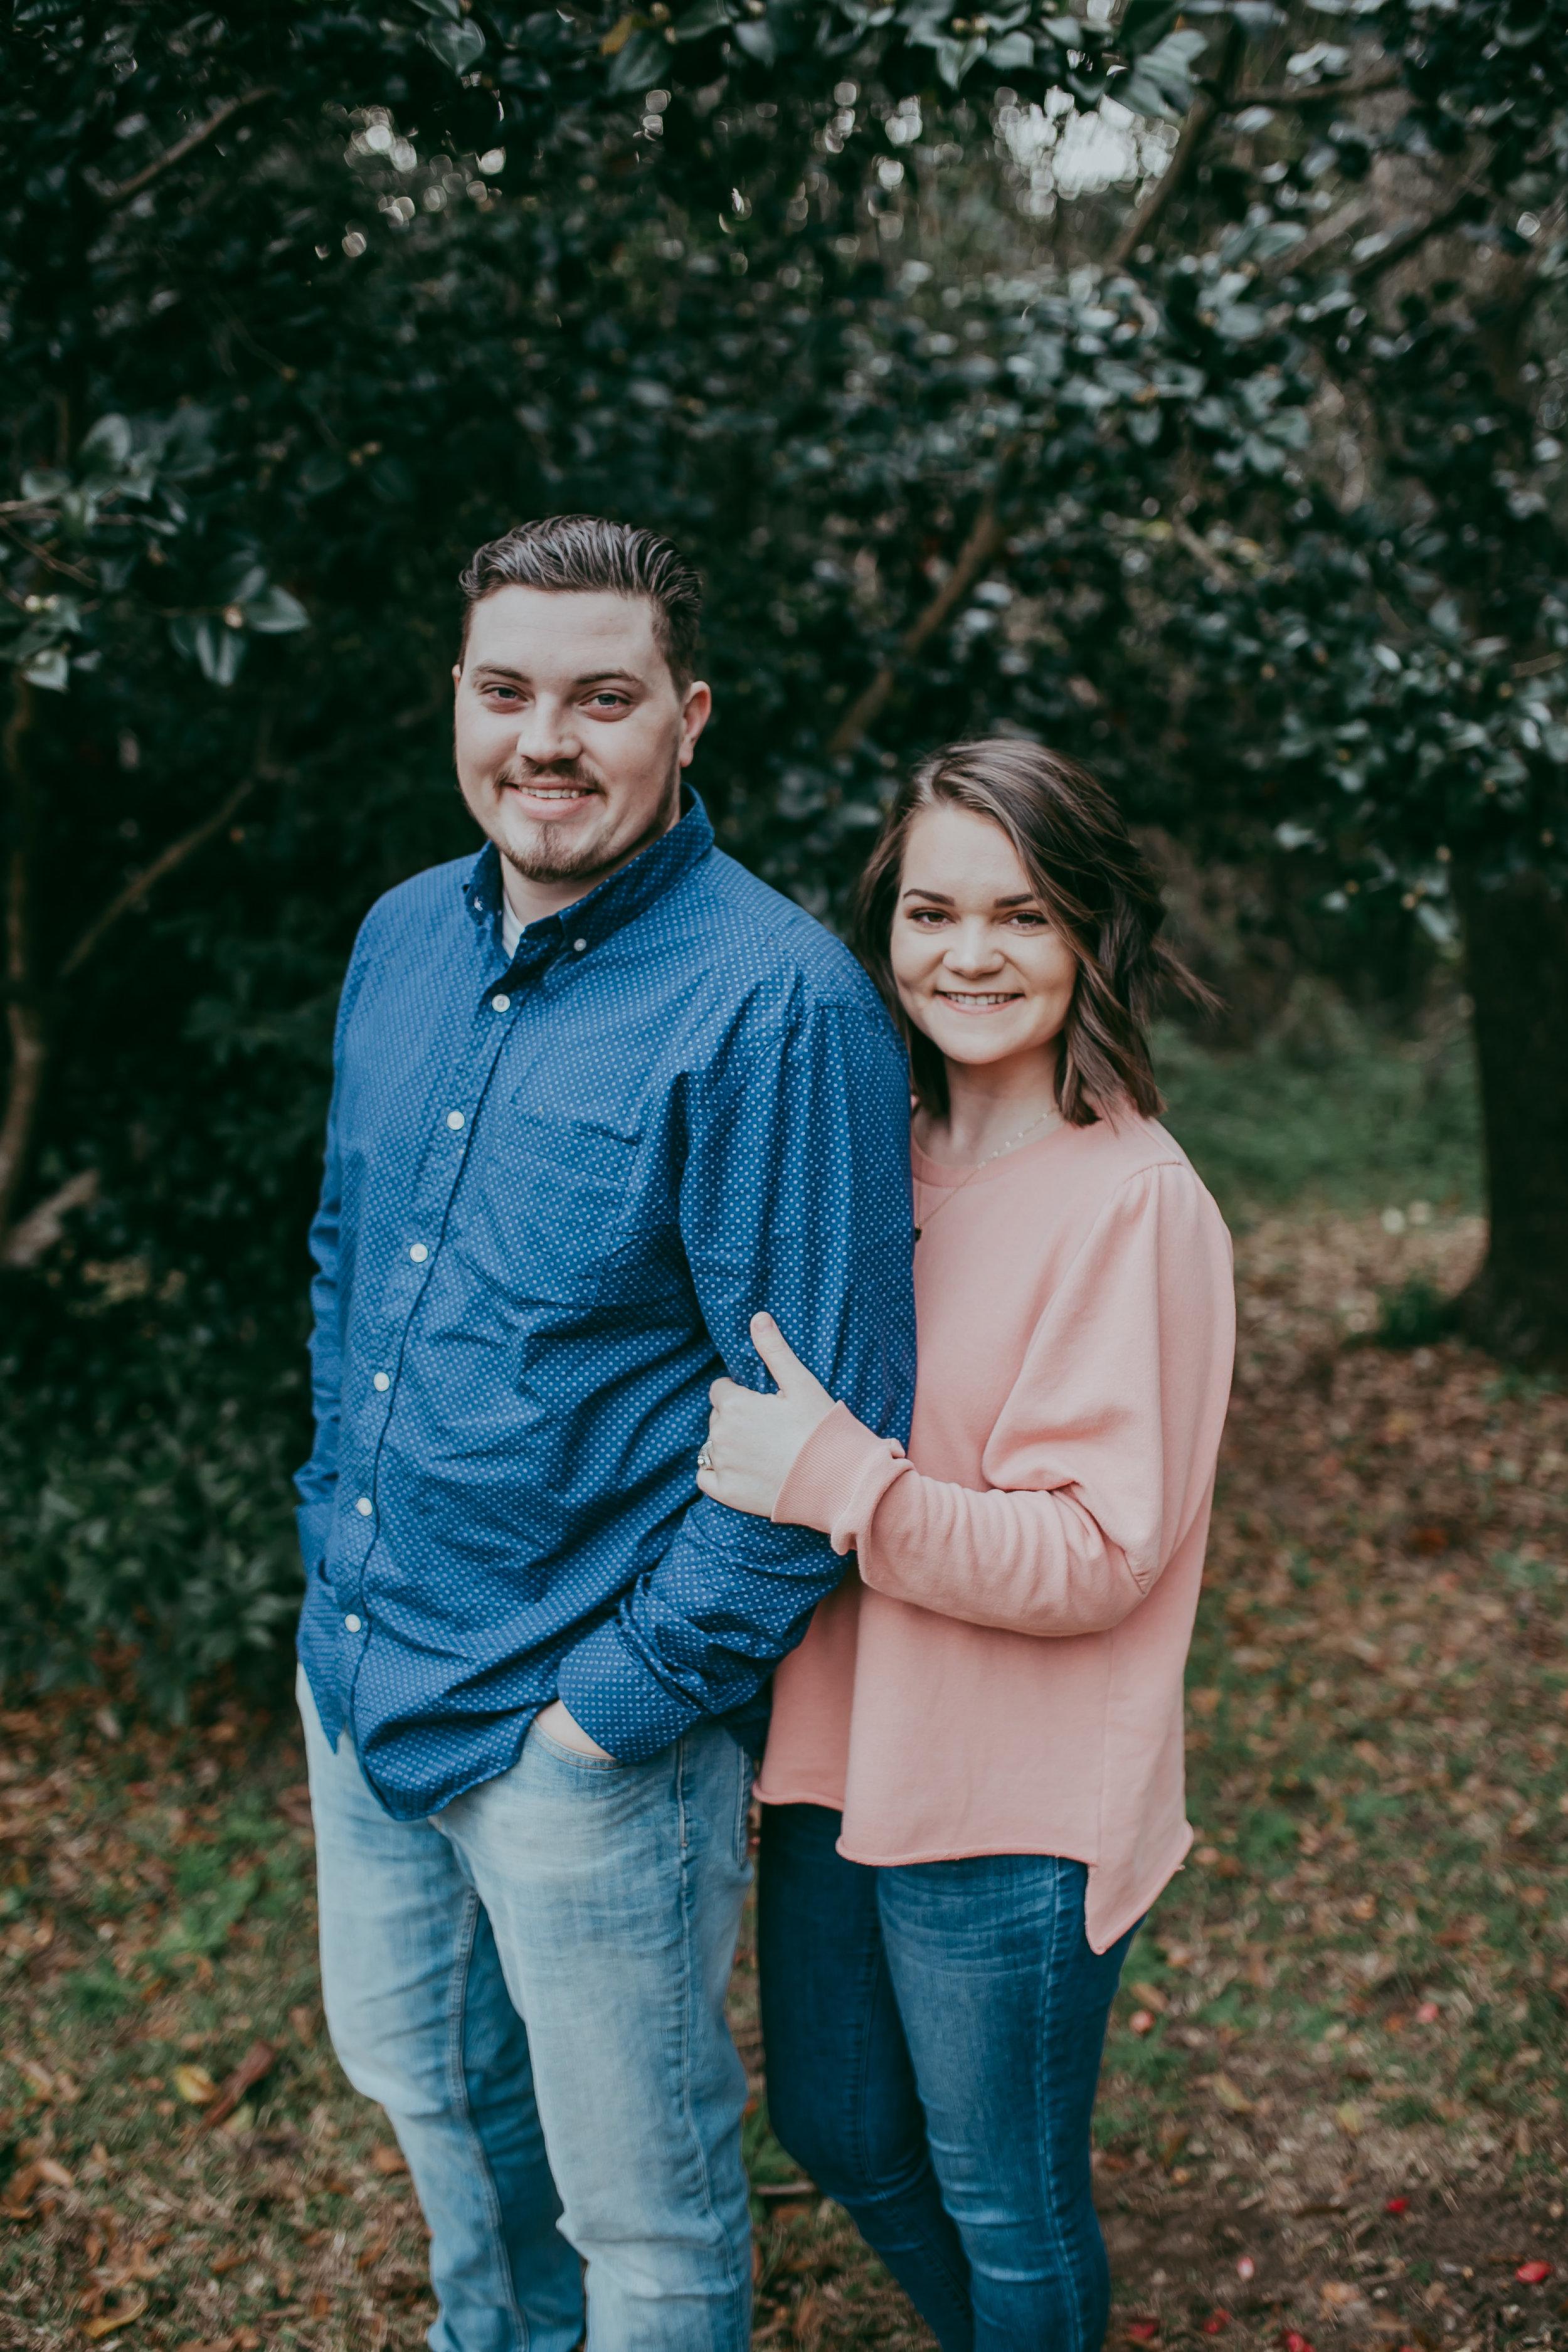 Shane and Erica Stringfellow - Messengers